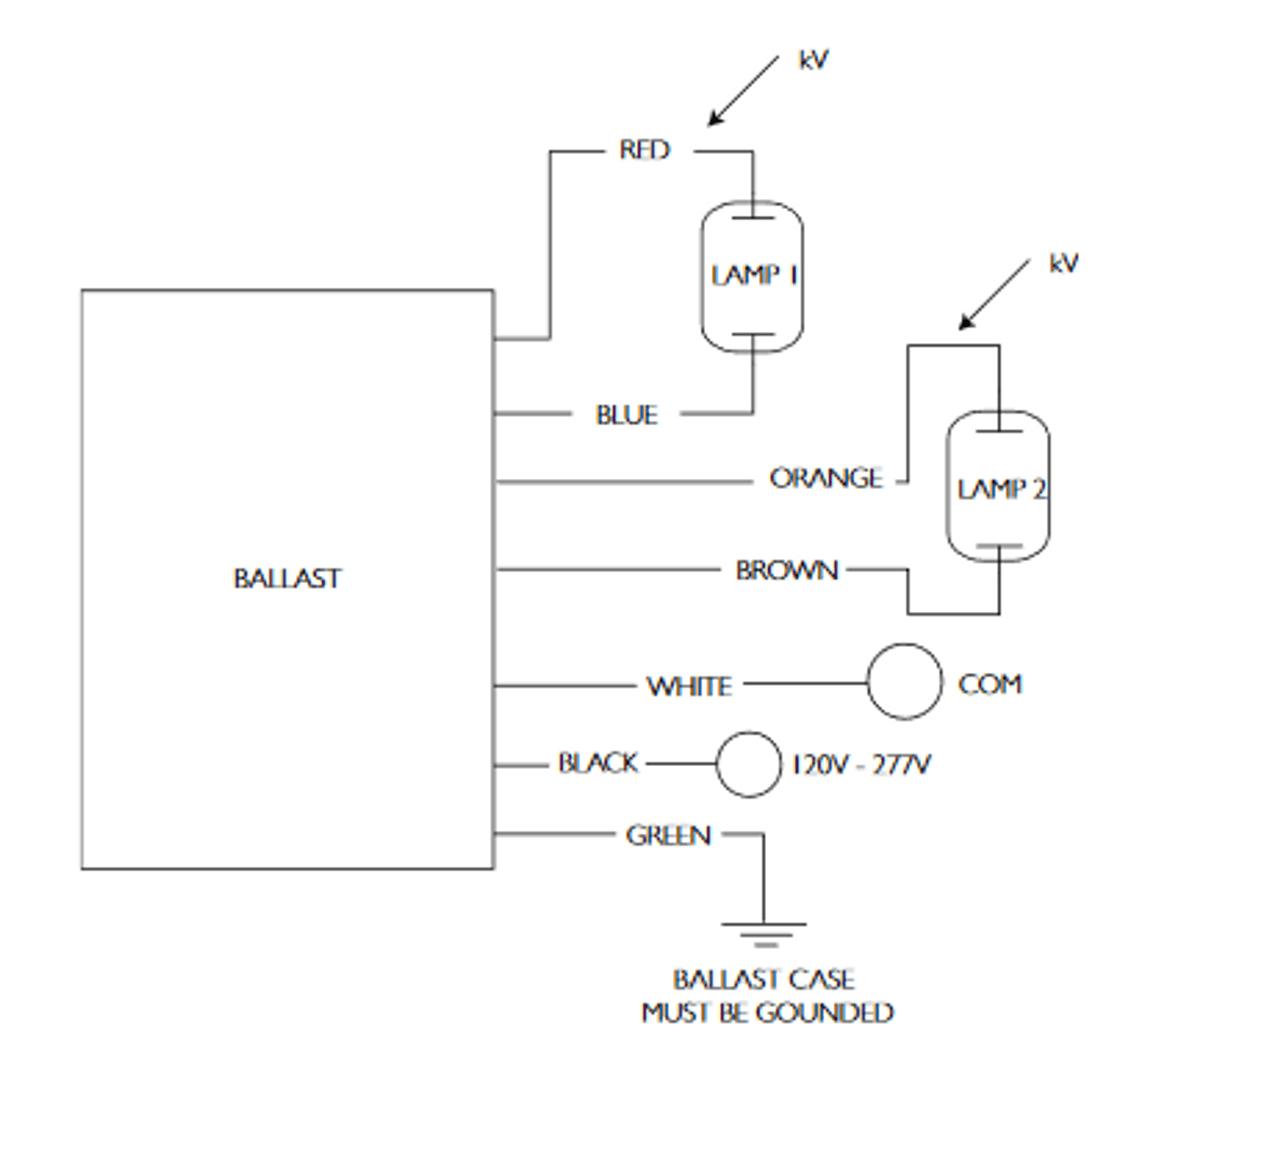 hight resolution of  philips advance ballast wiring diagram v on 1963 mopar ignition switch diagram ballast metal halide